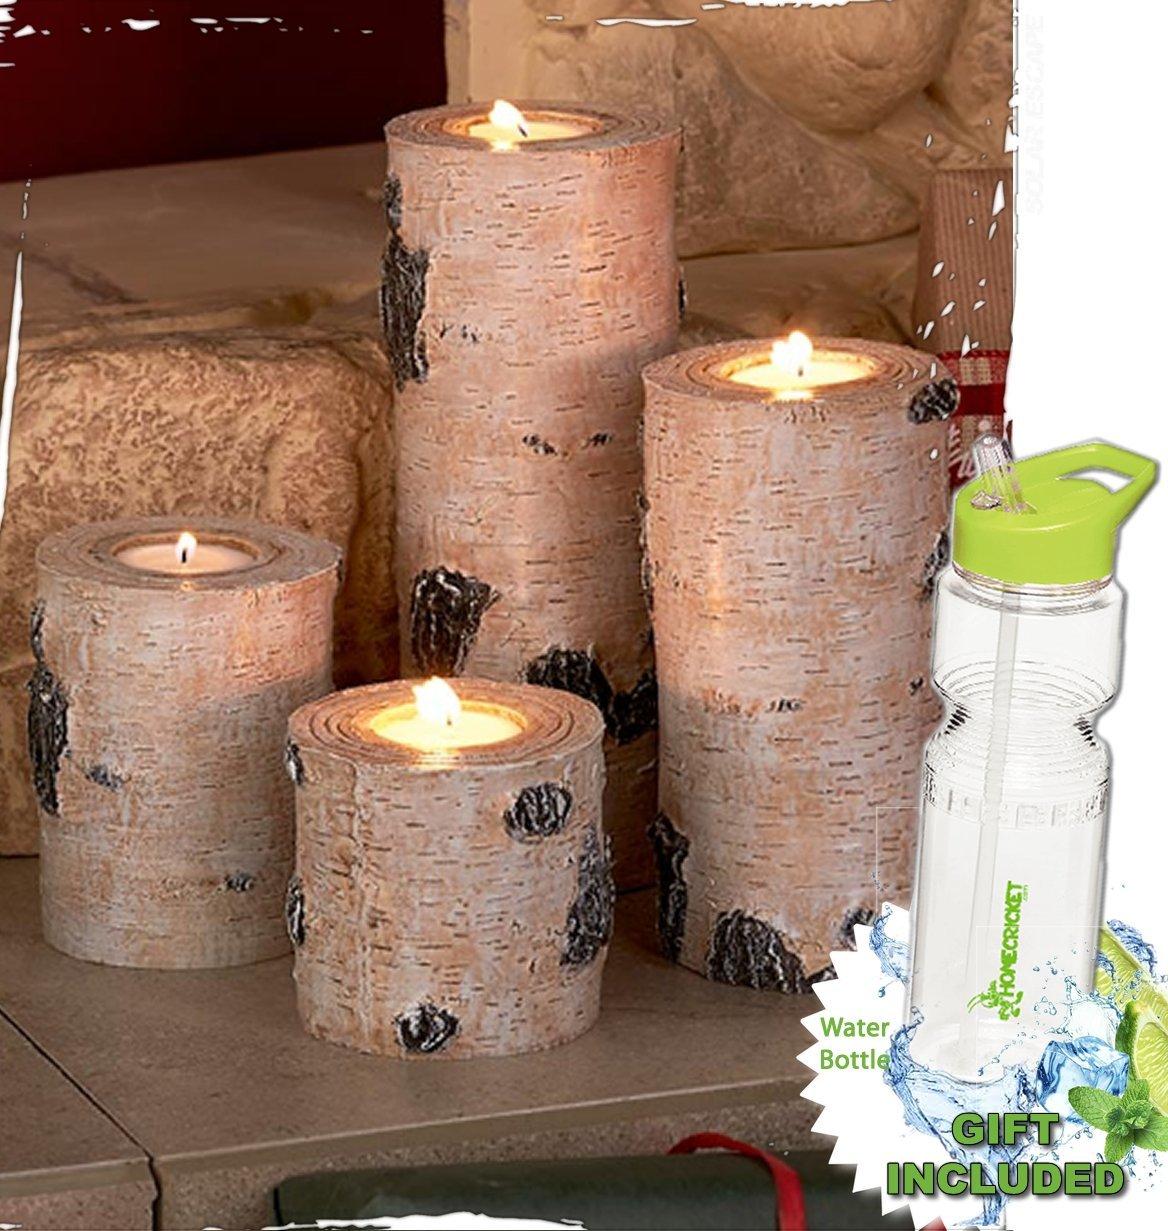 Gift Included- Nature Scene Set of 4 Tea Light Holders Woodland Tea Light Candleholders + FREE Bonus 23 oz Water Bottle byHomecricket